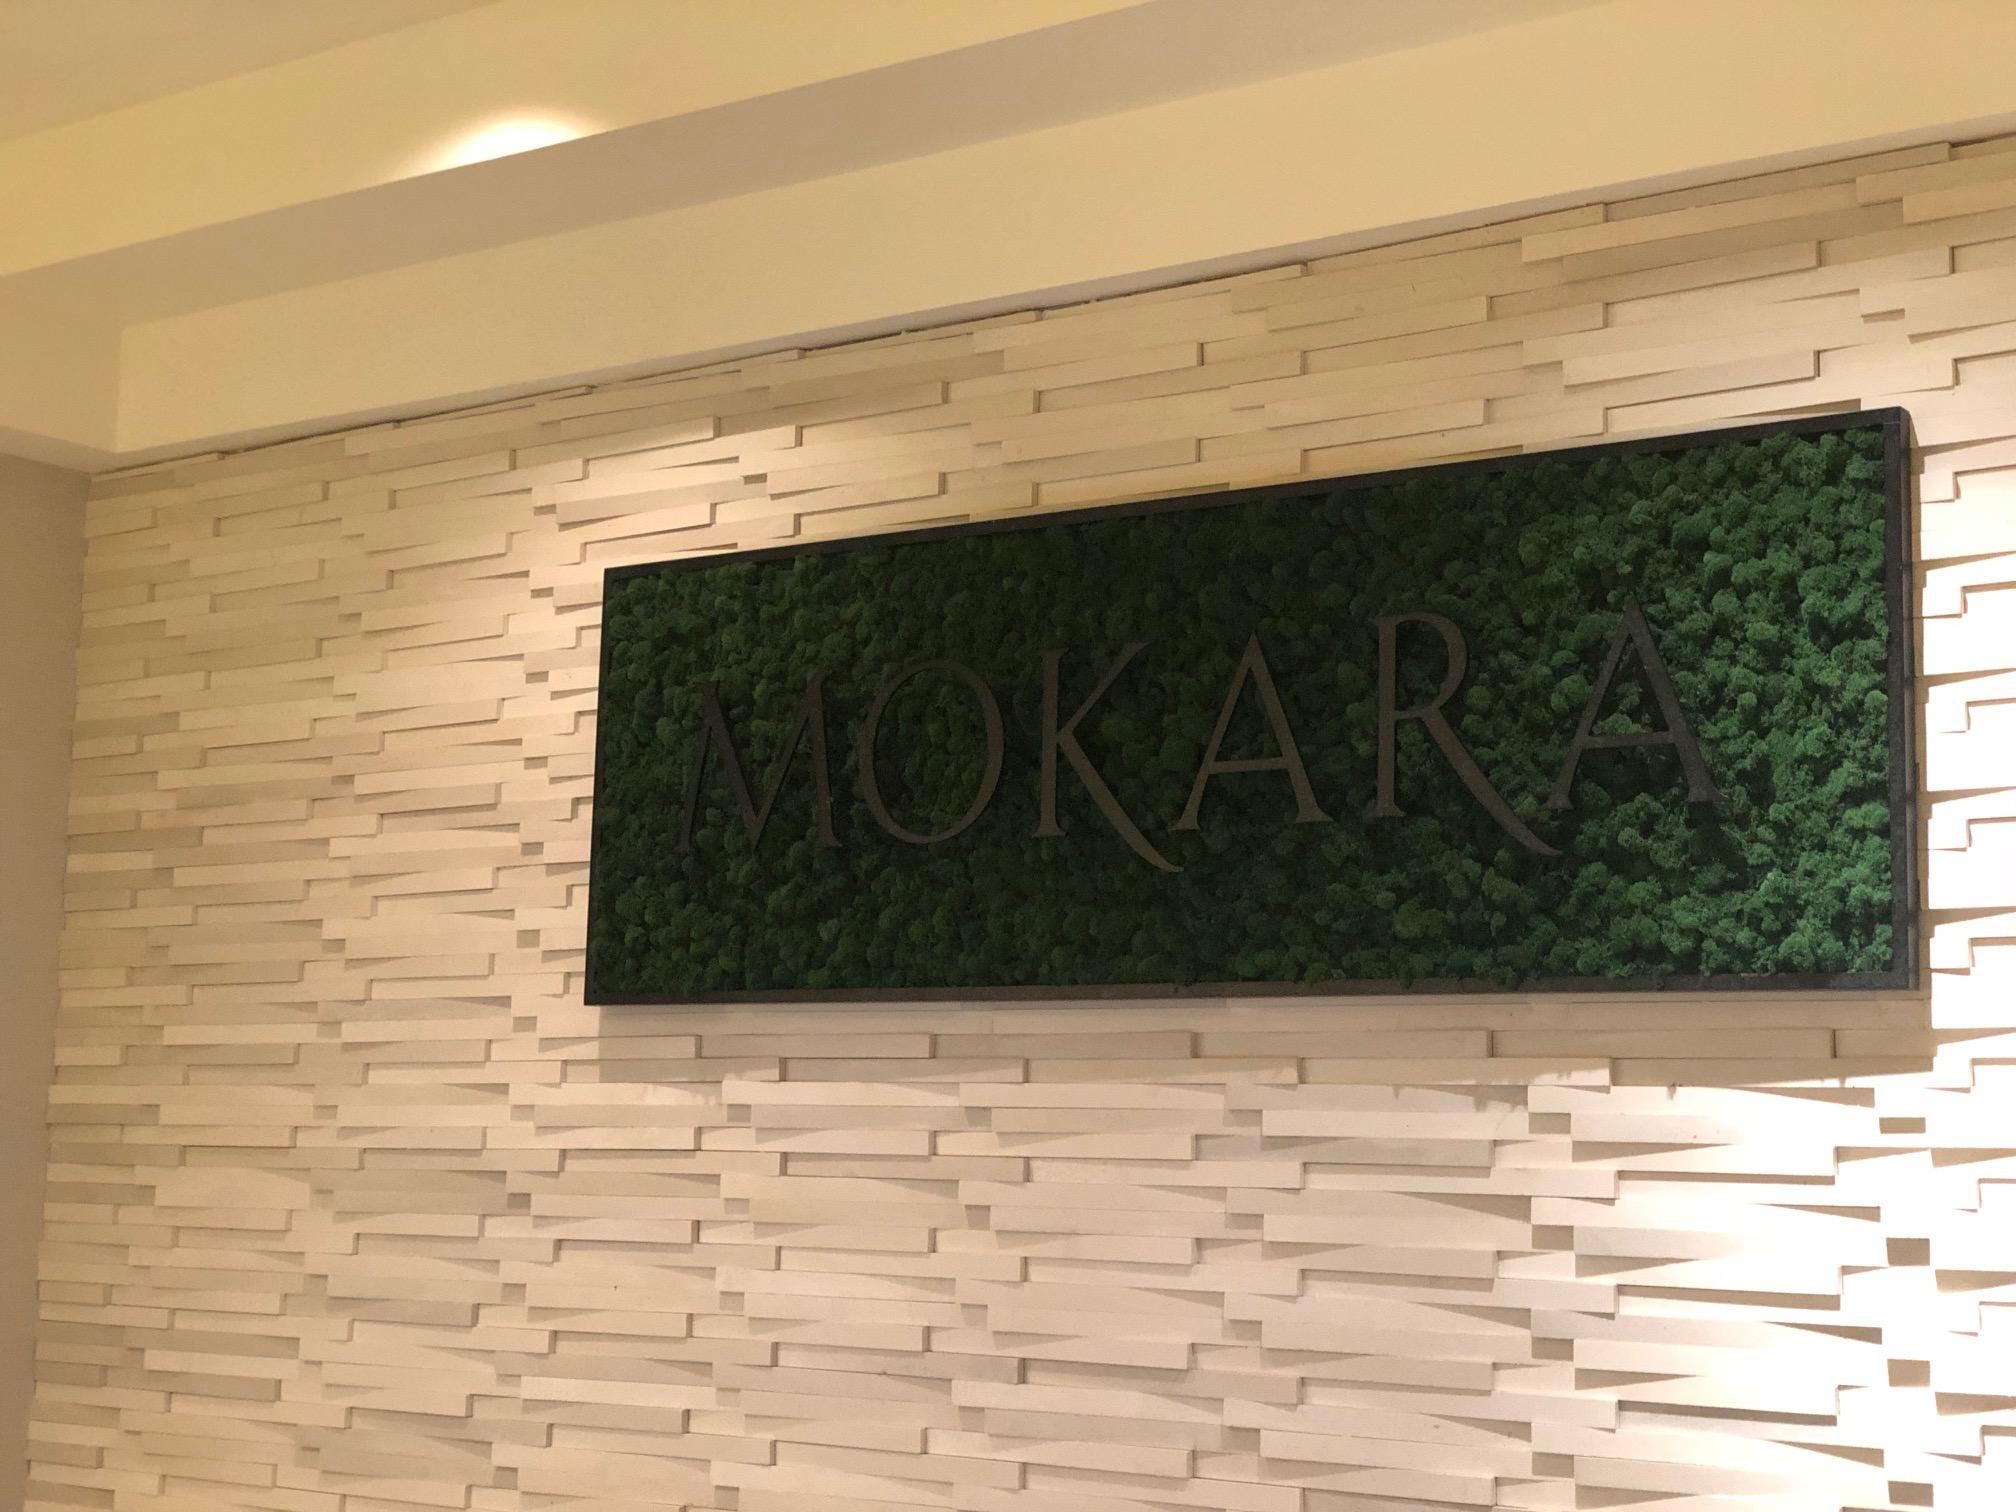 Mokara Logo with Moss installed